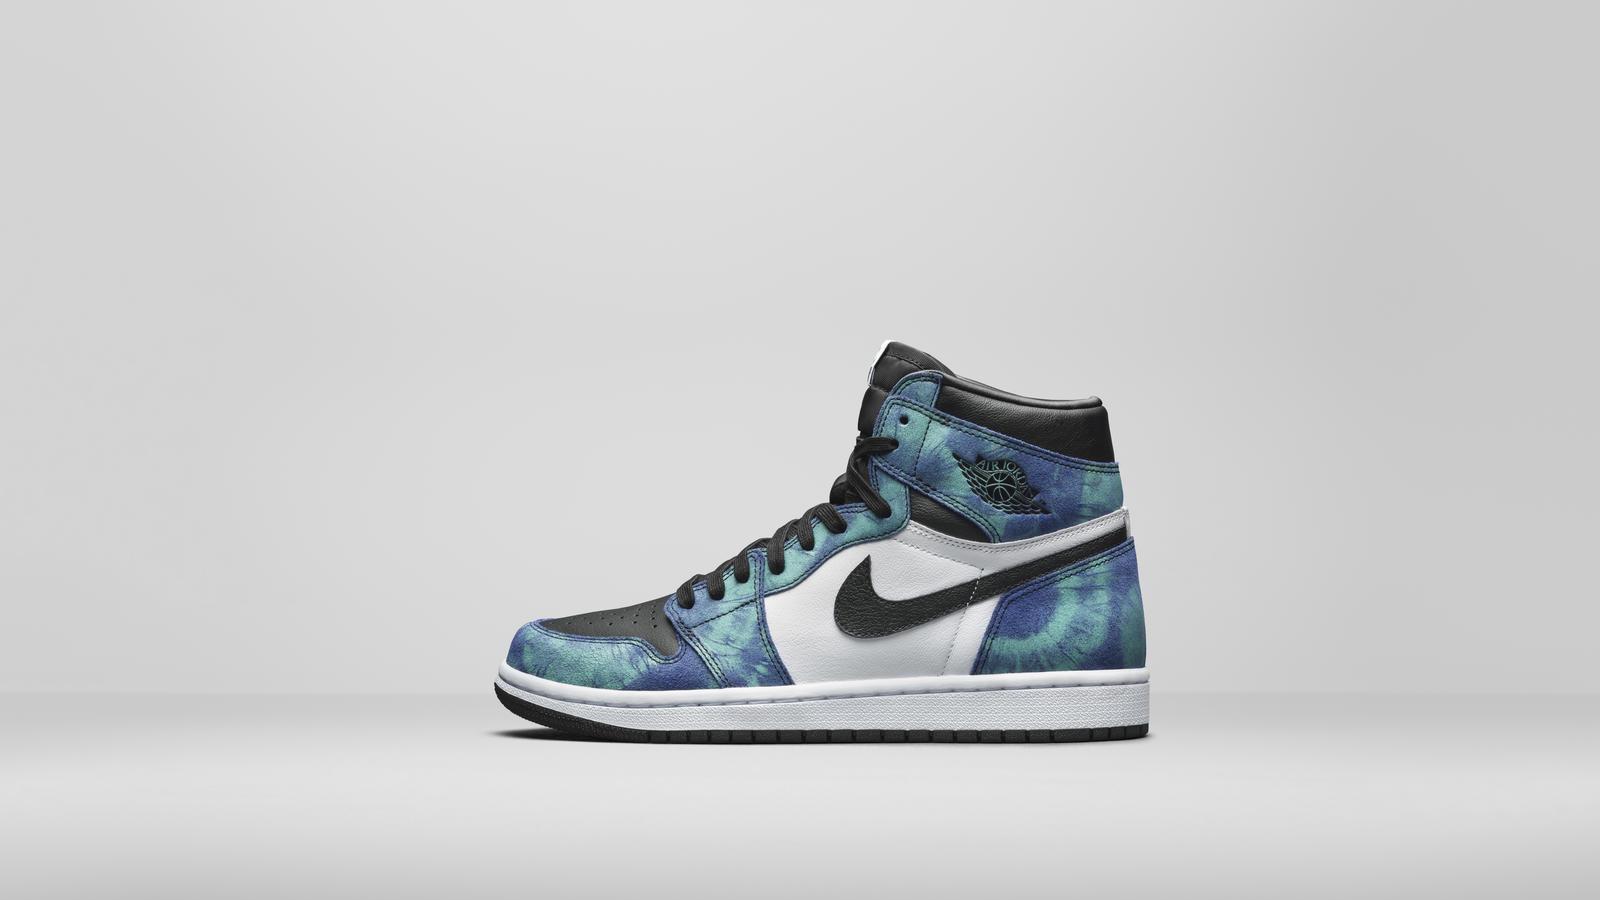 Jordan Brand Summer 2020 Releases